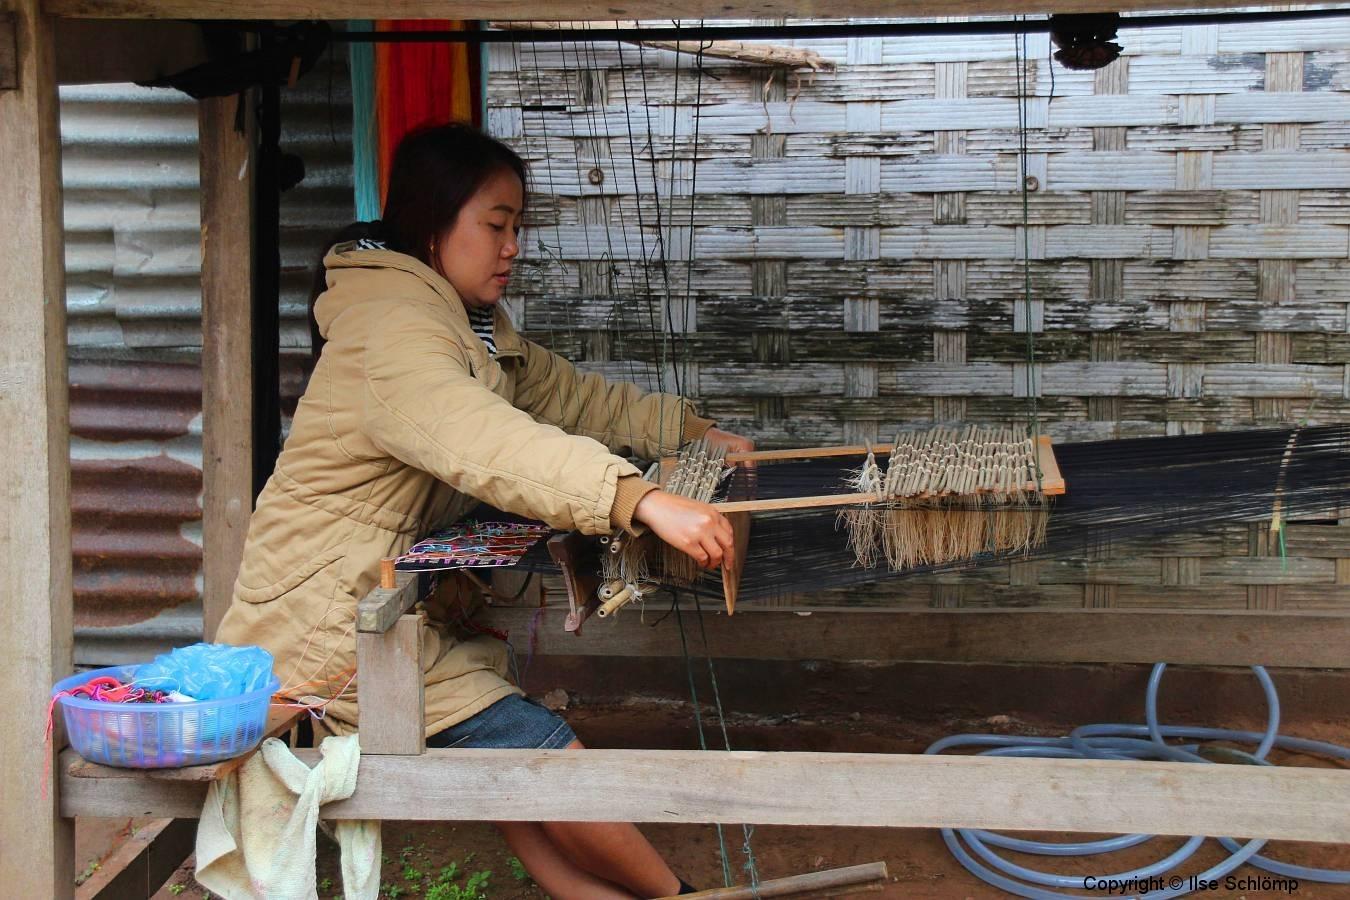 Laos, Muang Ngoi Neua, Am Webstuhl